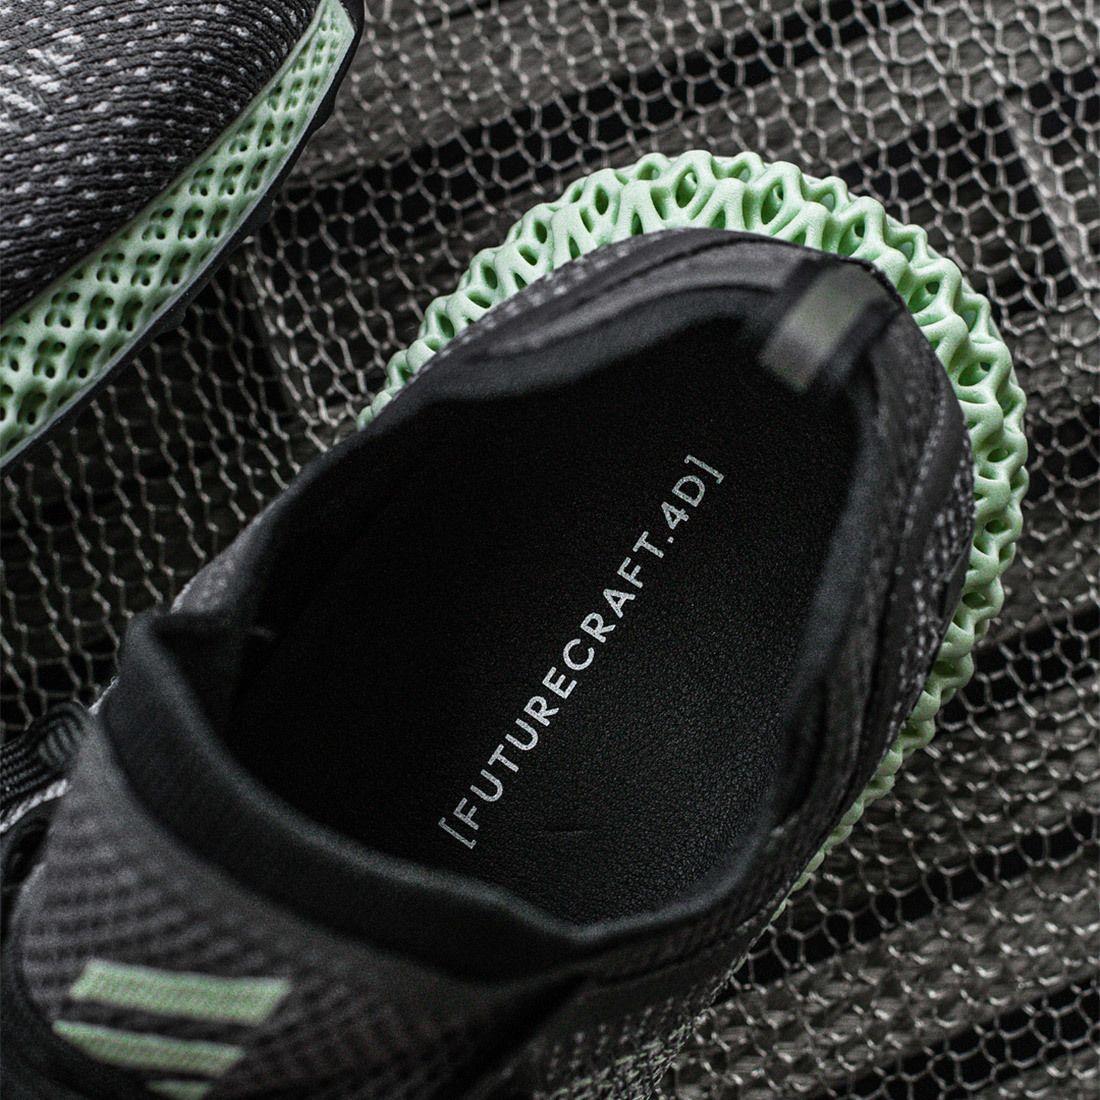 Adidas Alphaedge 4 D 5